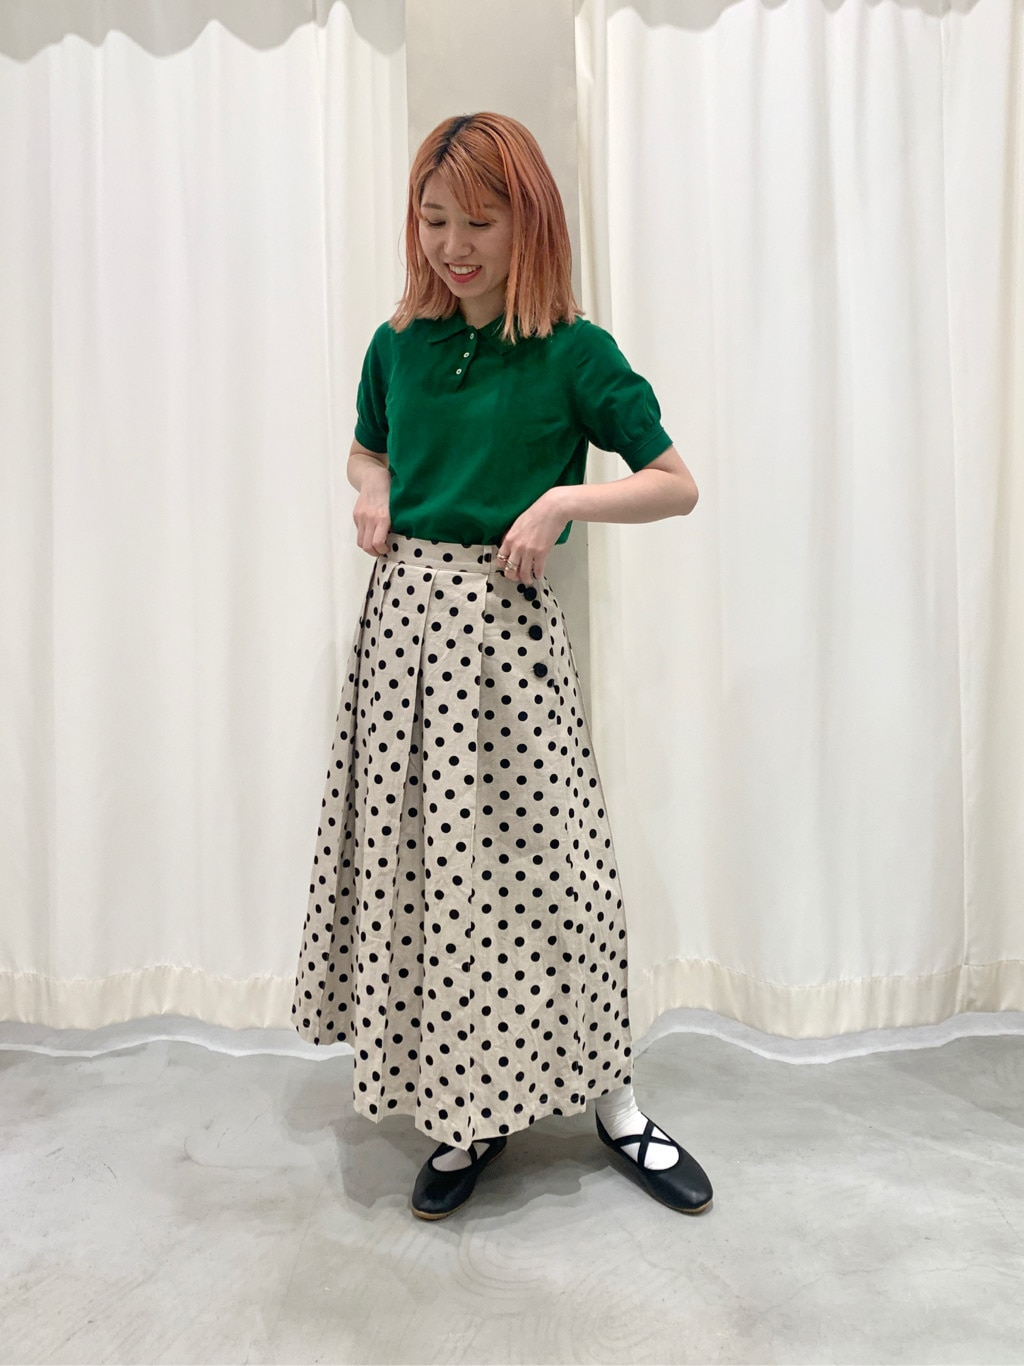 CHILD WOMAN , PAR ICI 東京スカイツリータウン・ソラマチ 2021.05.18